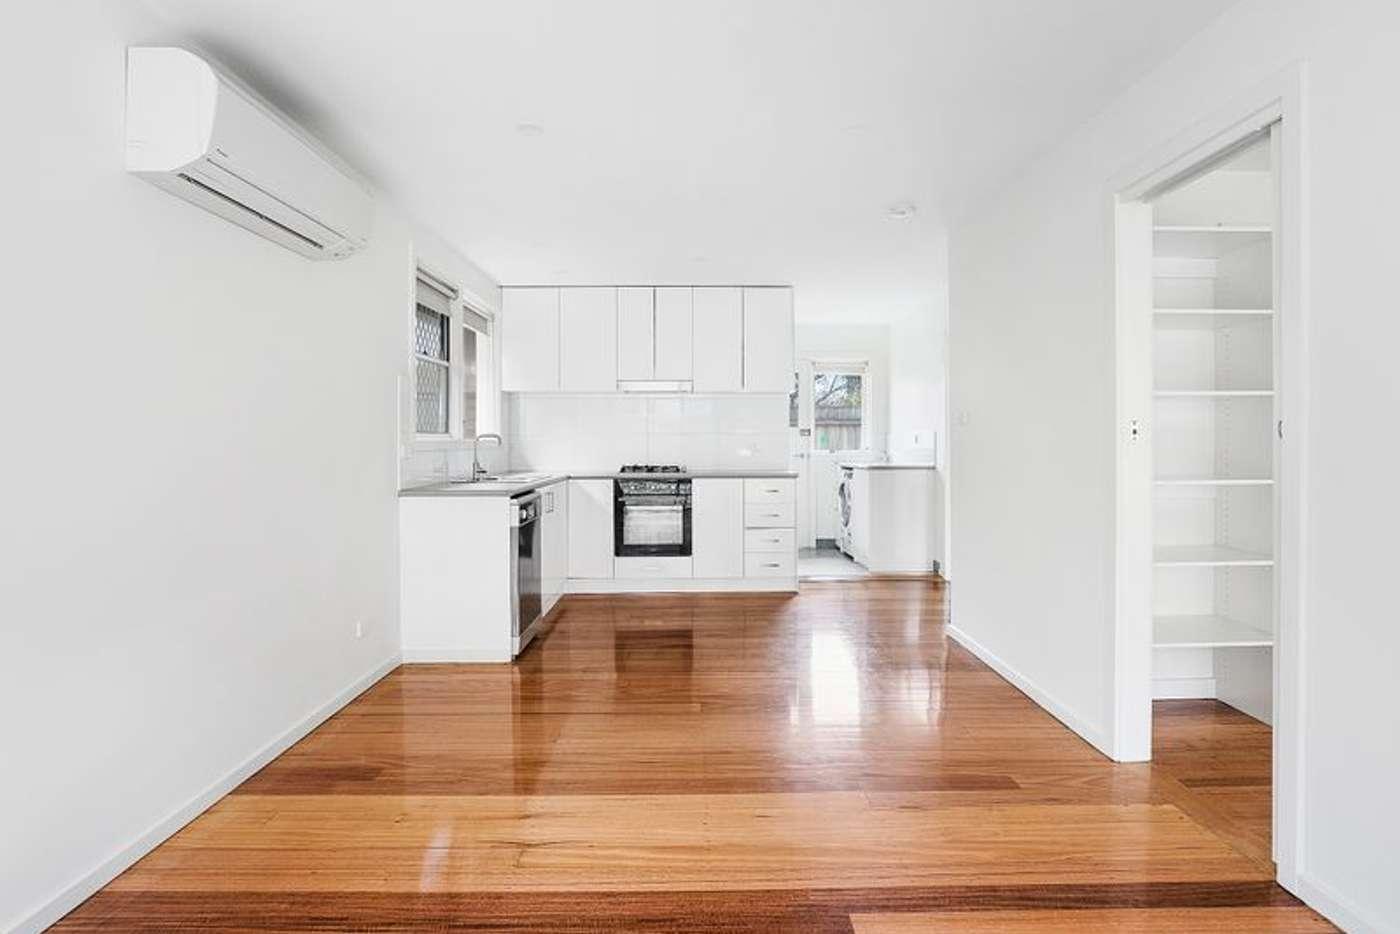 Main view of Homely unit listing, 5/104 Keon Street, Thornbury VIC 3071